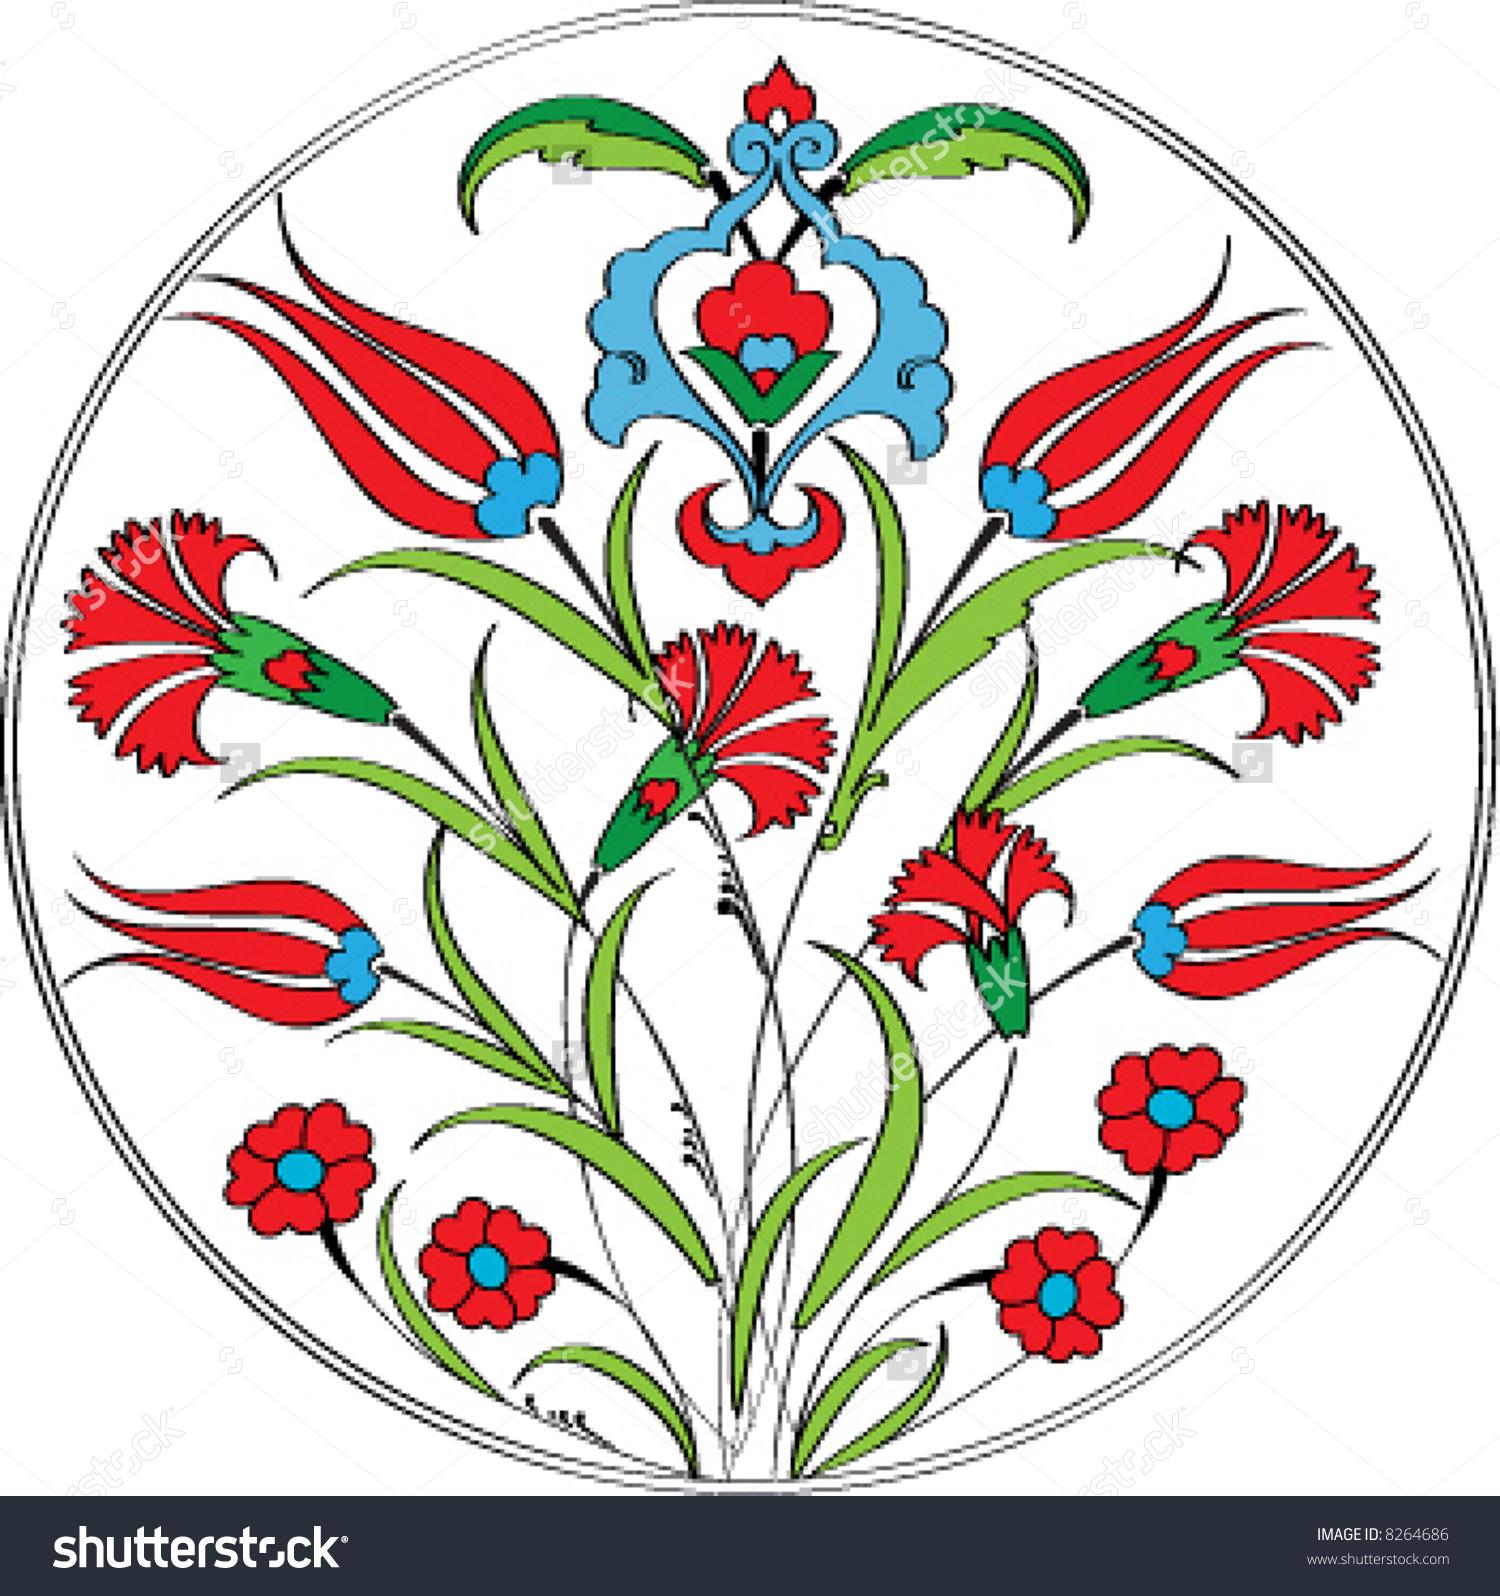 Ottoman Tulip Stock Vectors & Vector Clip Art.